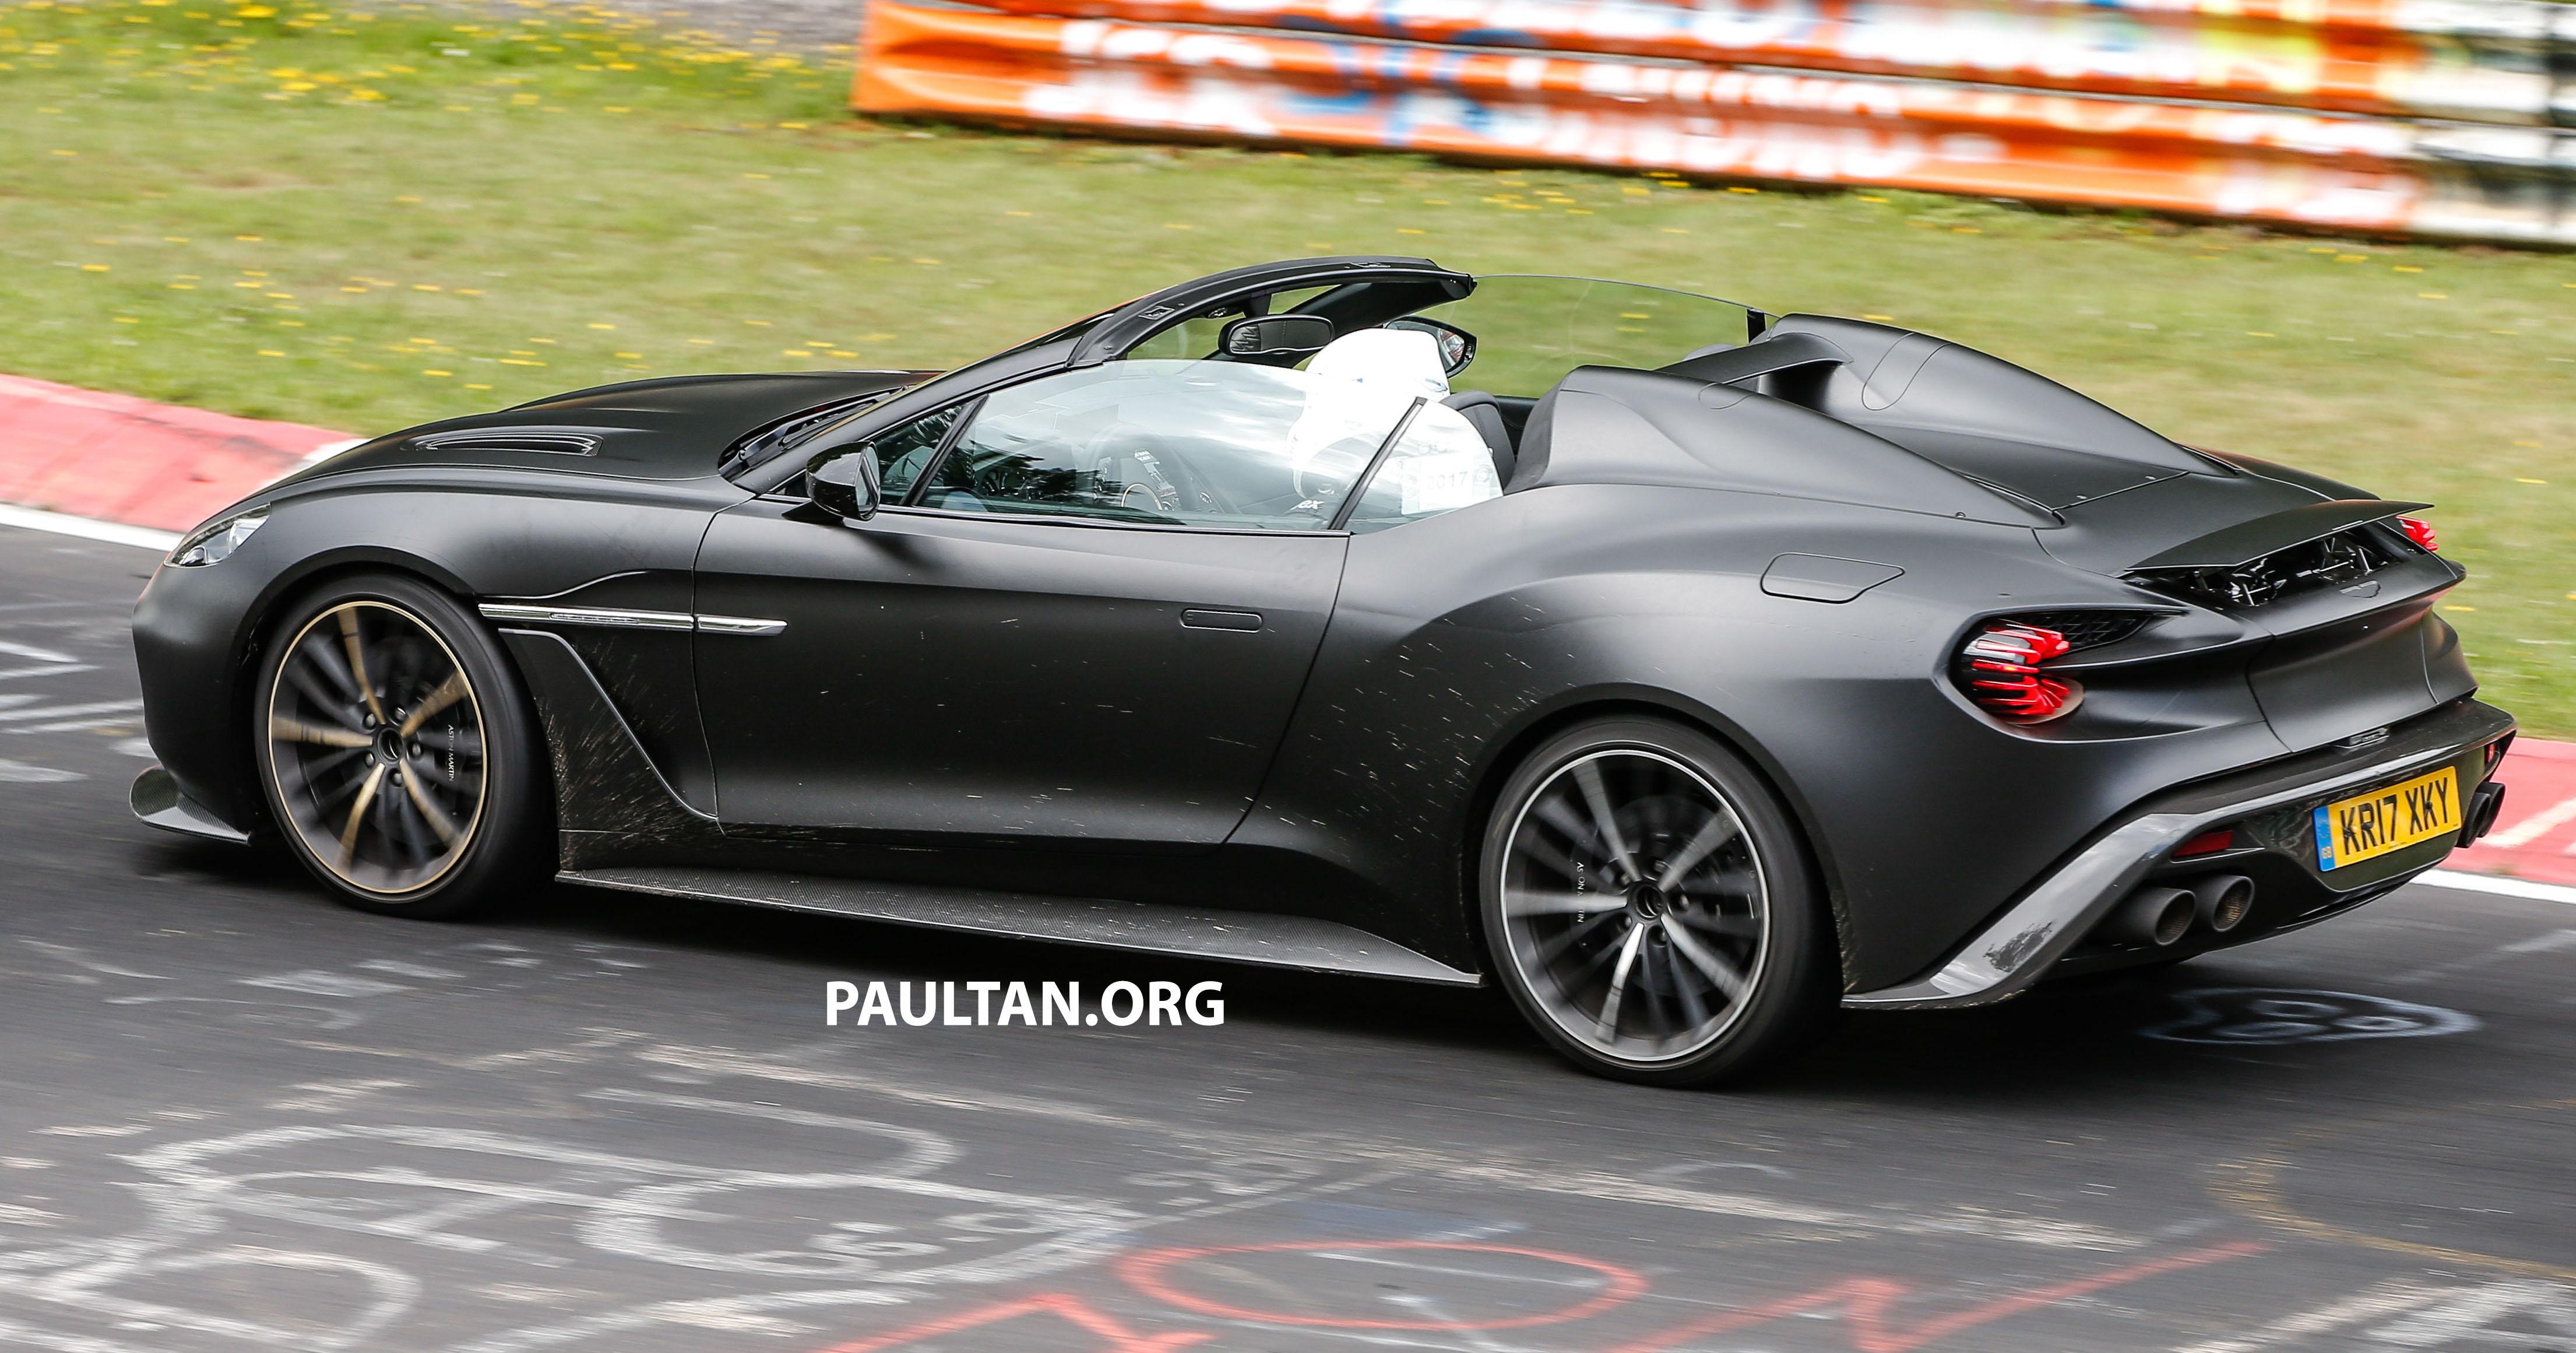 Aston Martin Vanquish Zagato Speedster 24 Paul Tan S Automotive News